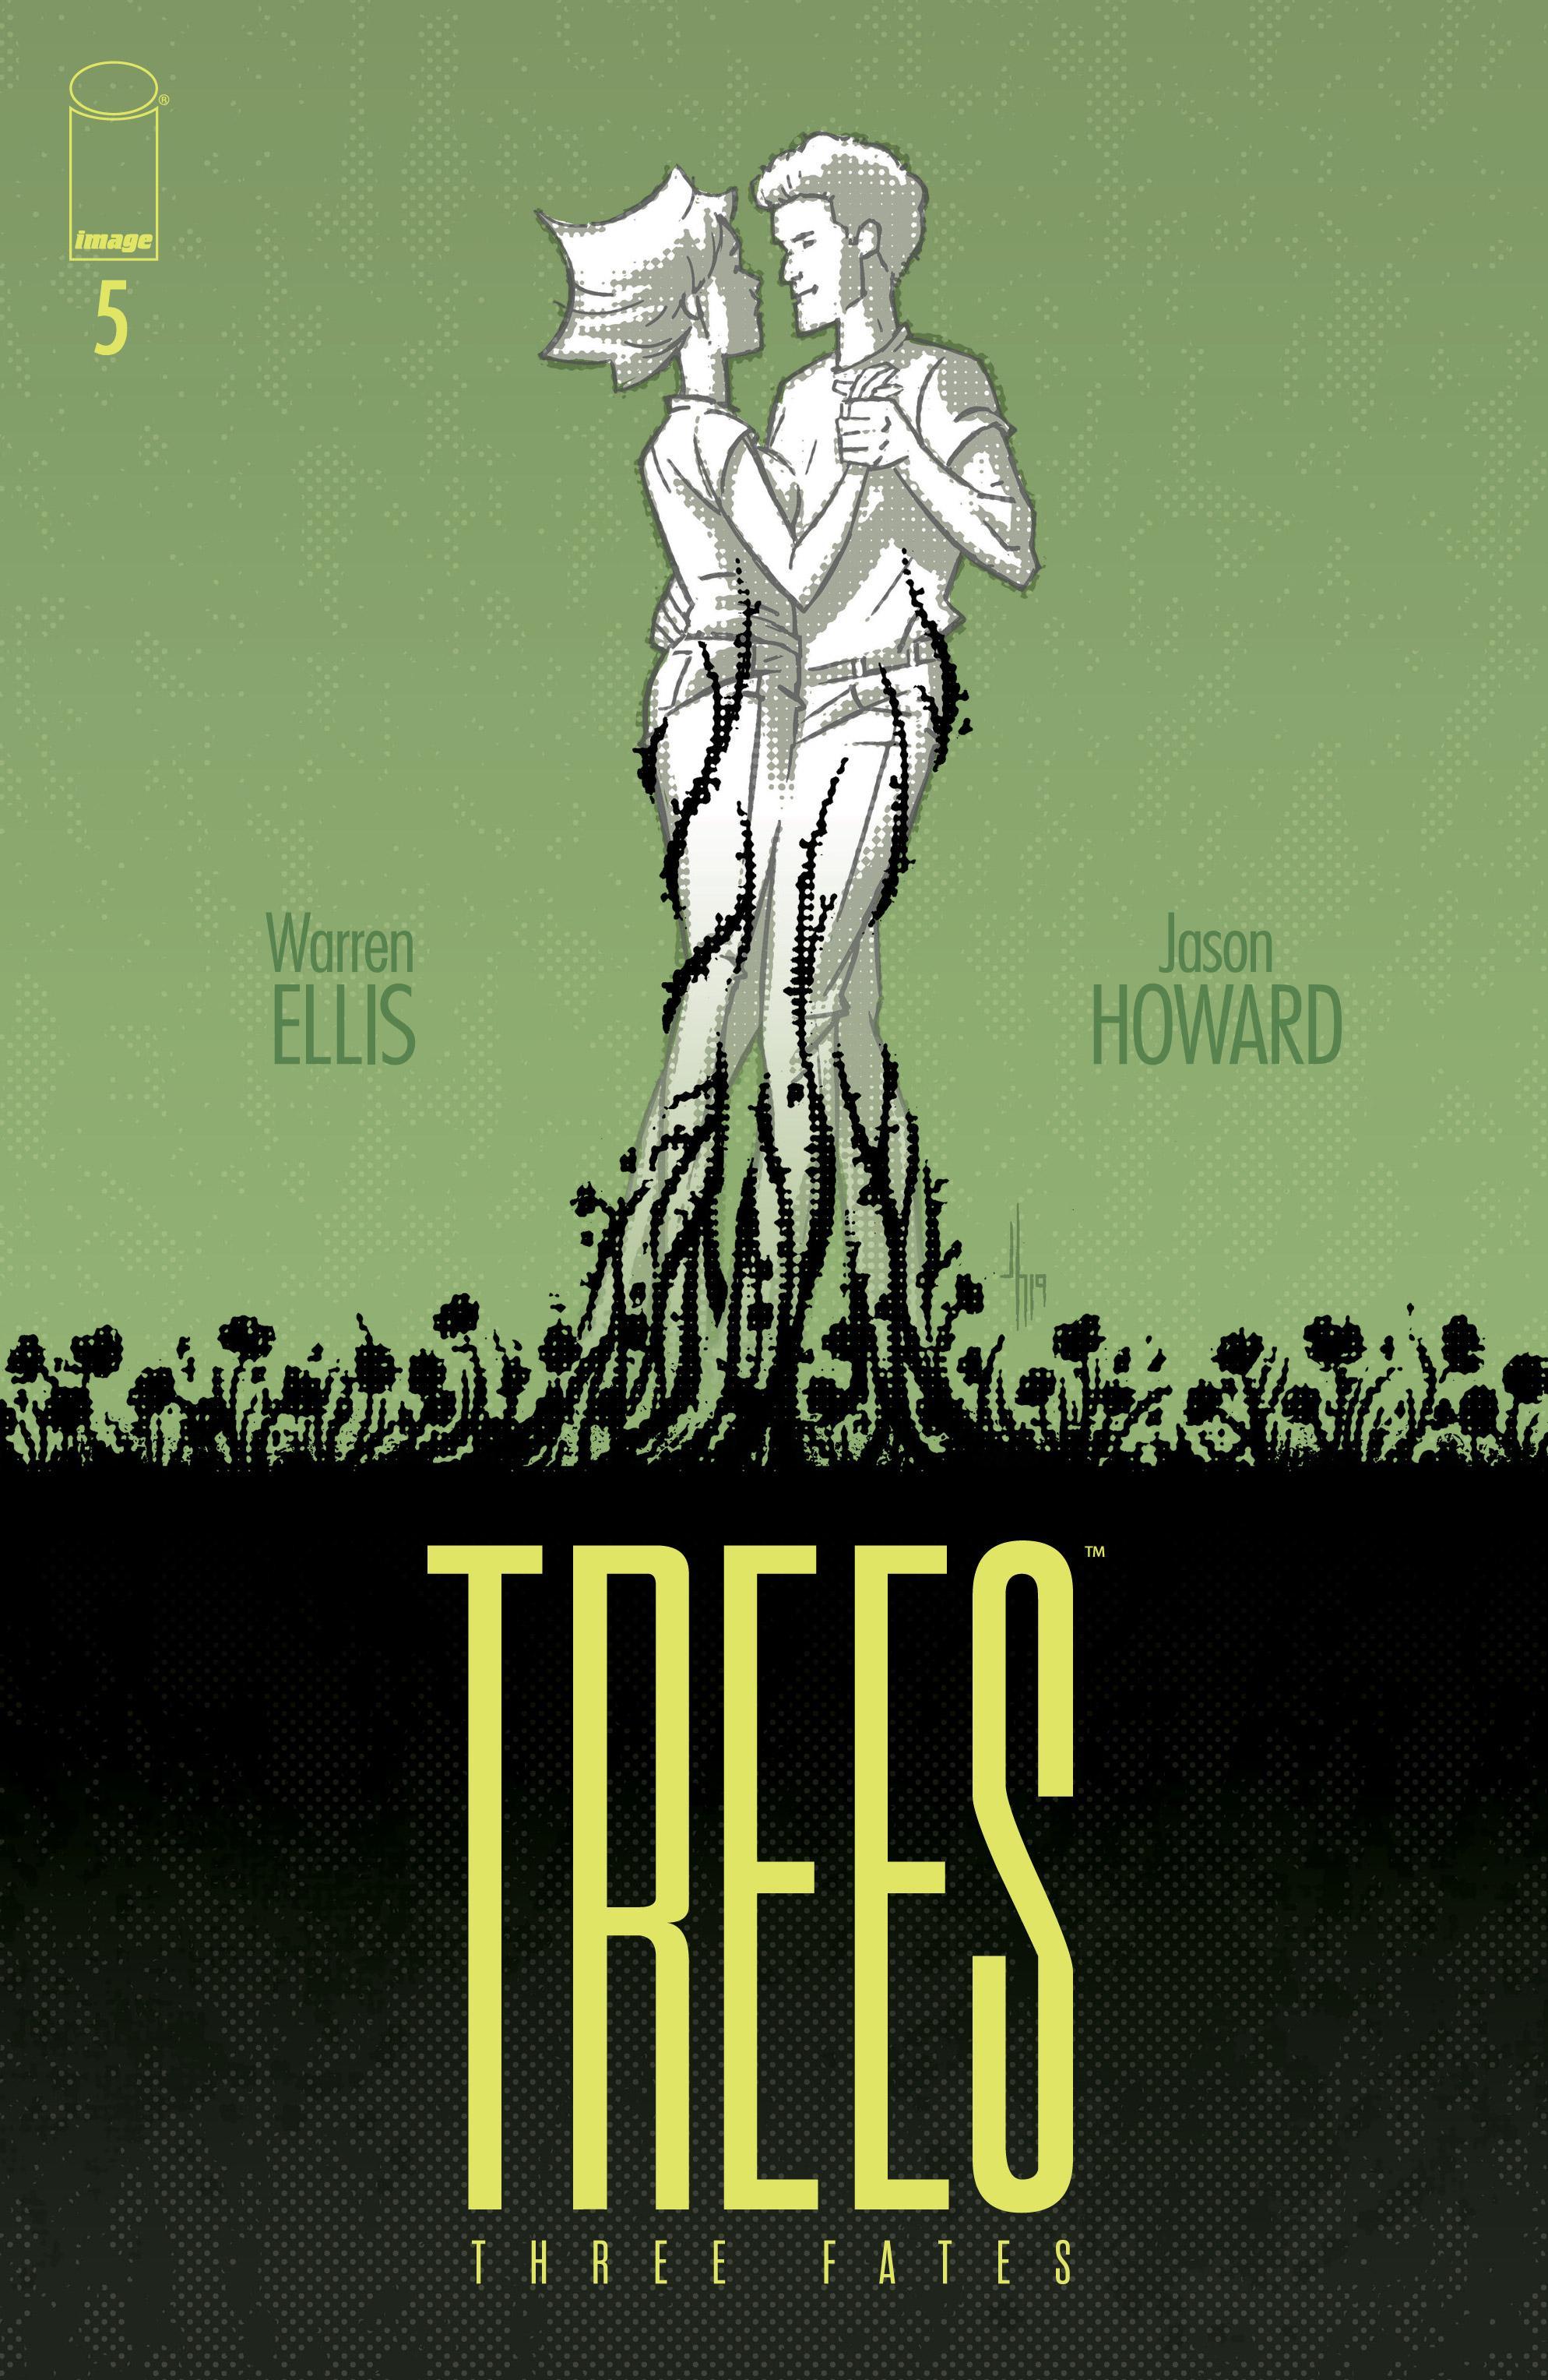 Trees-Three Fates 005 2020 Digital Zone